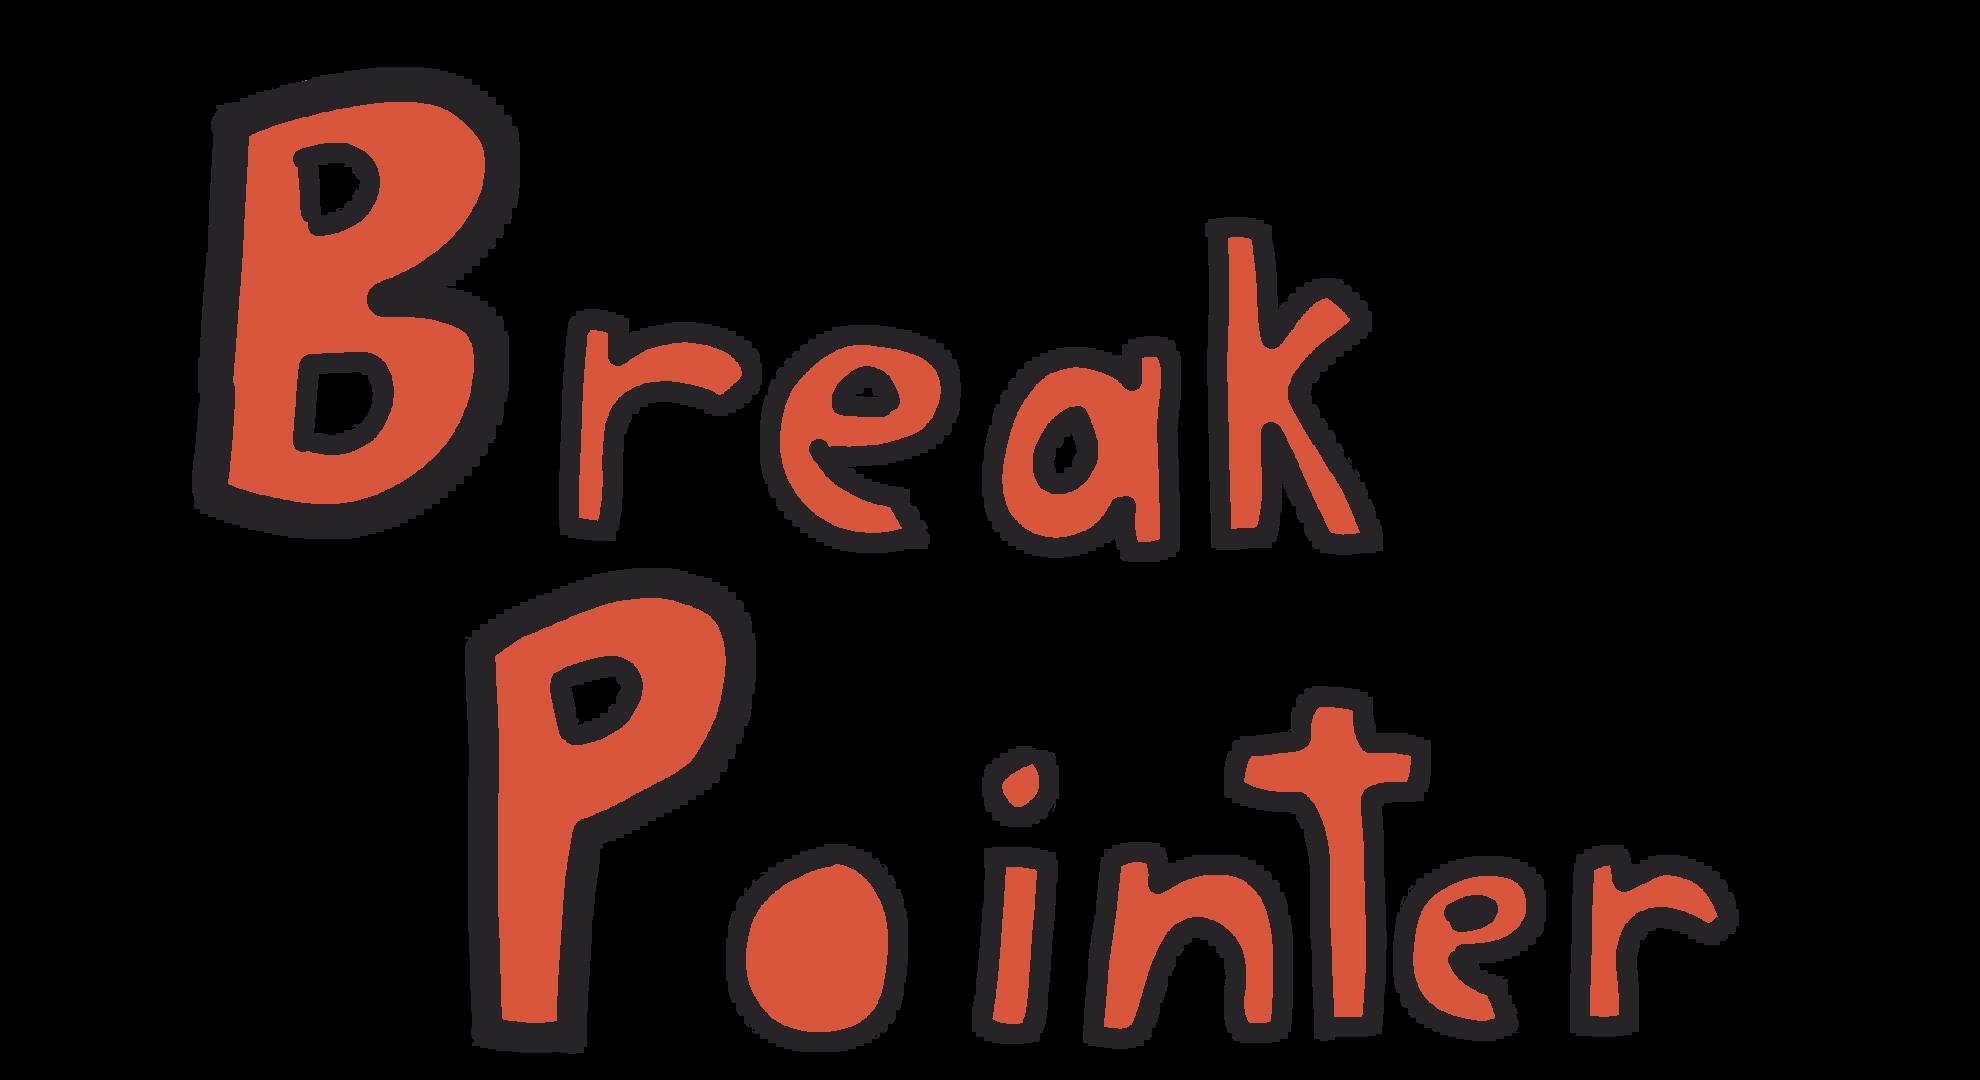 PointBreaker